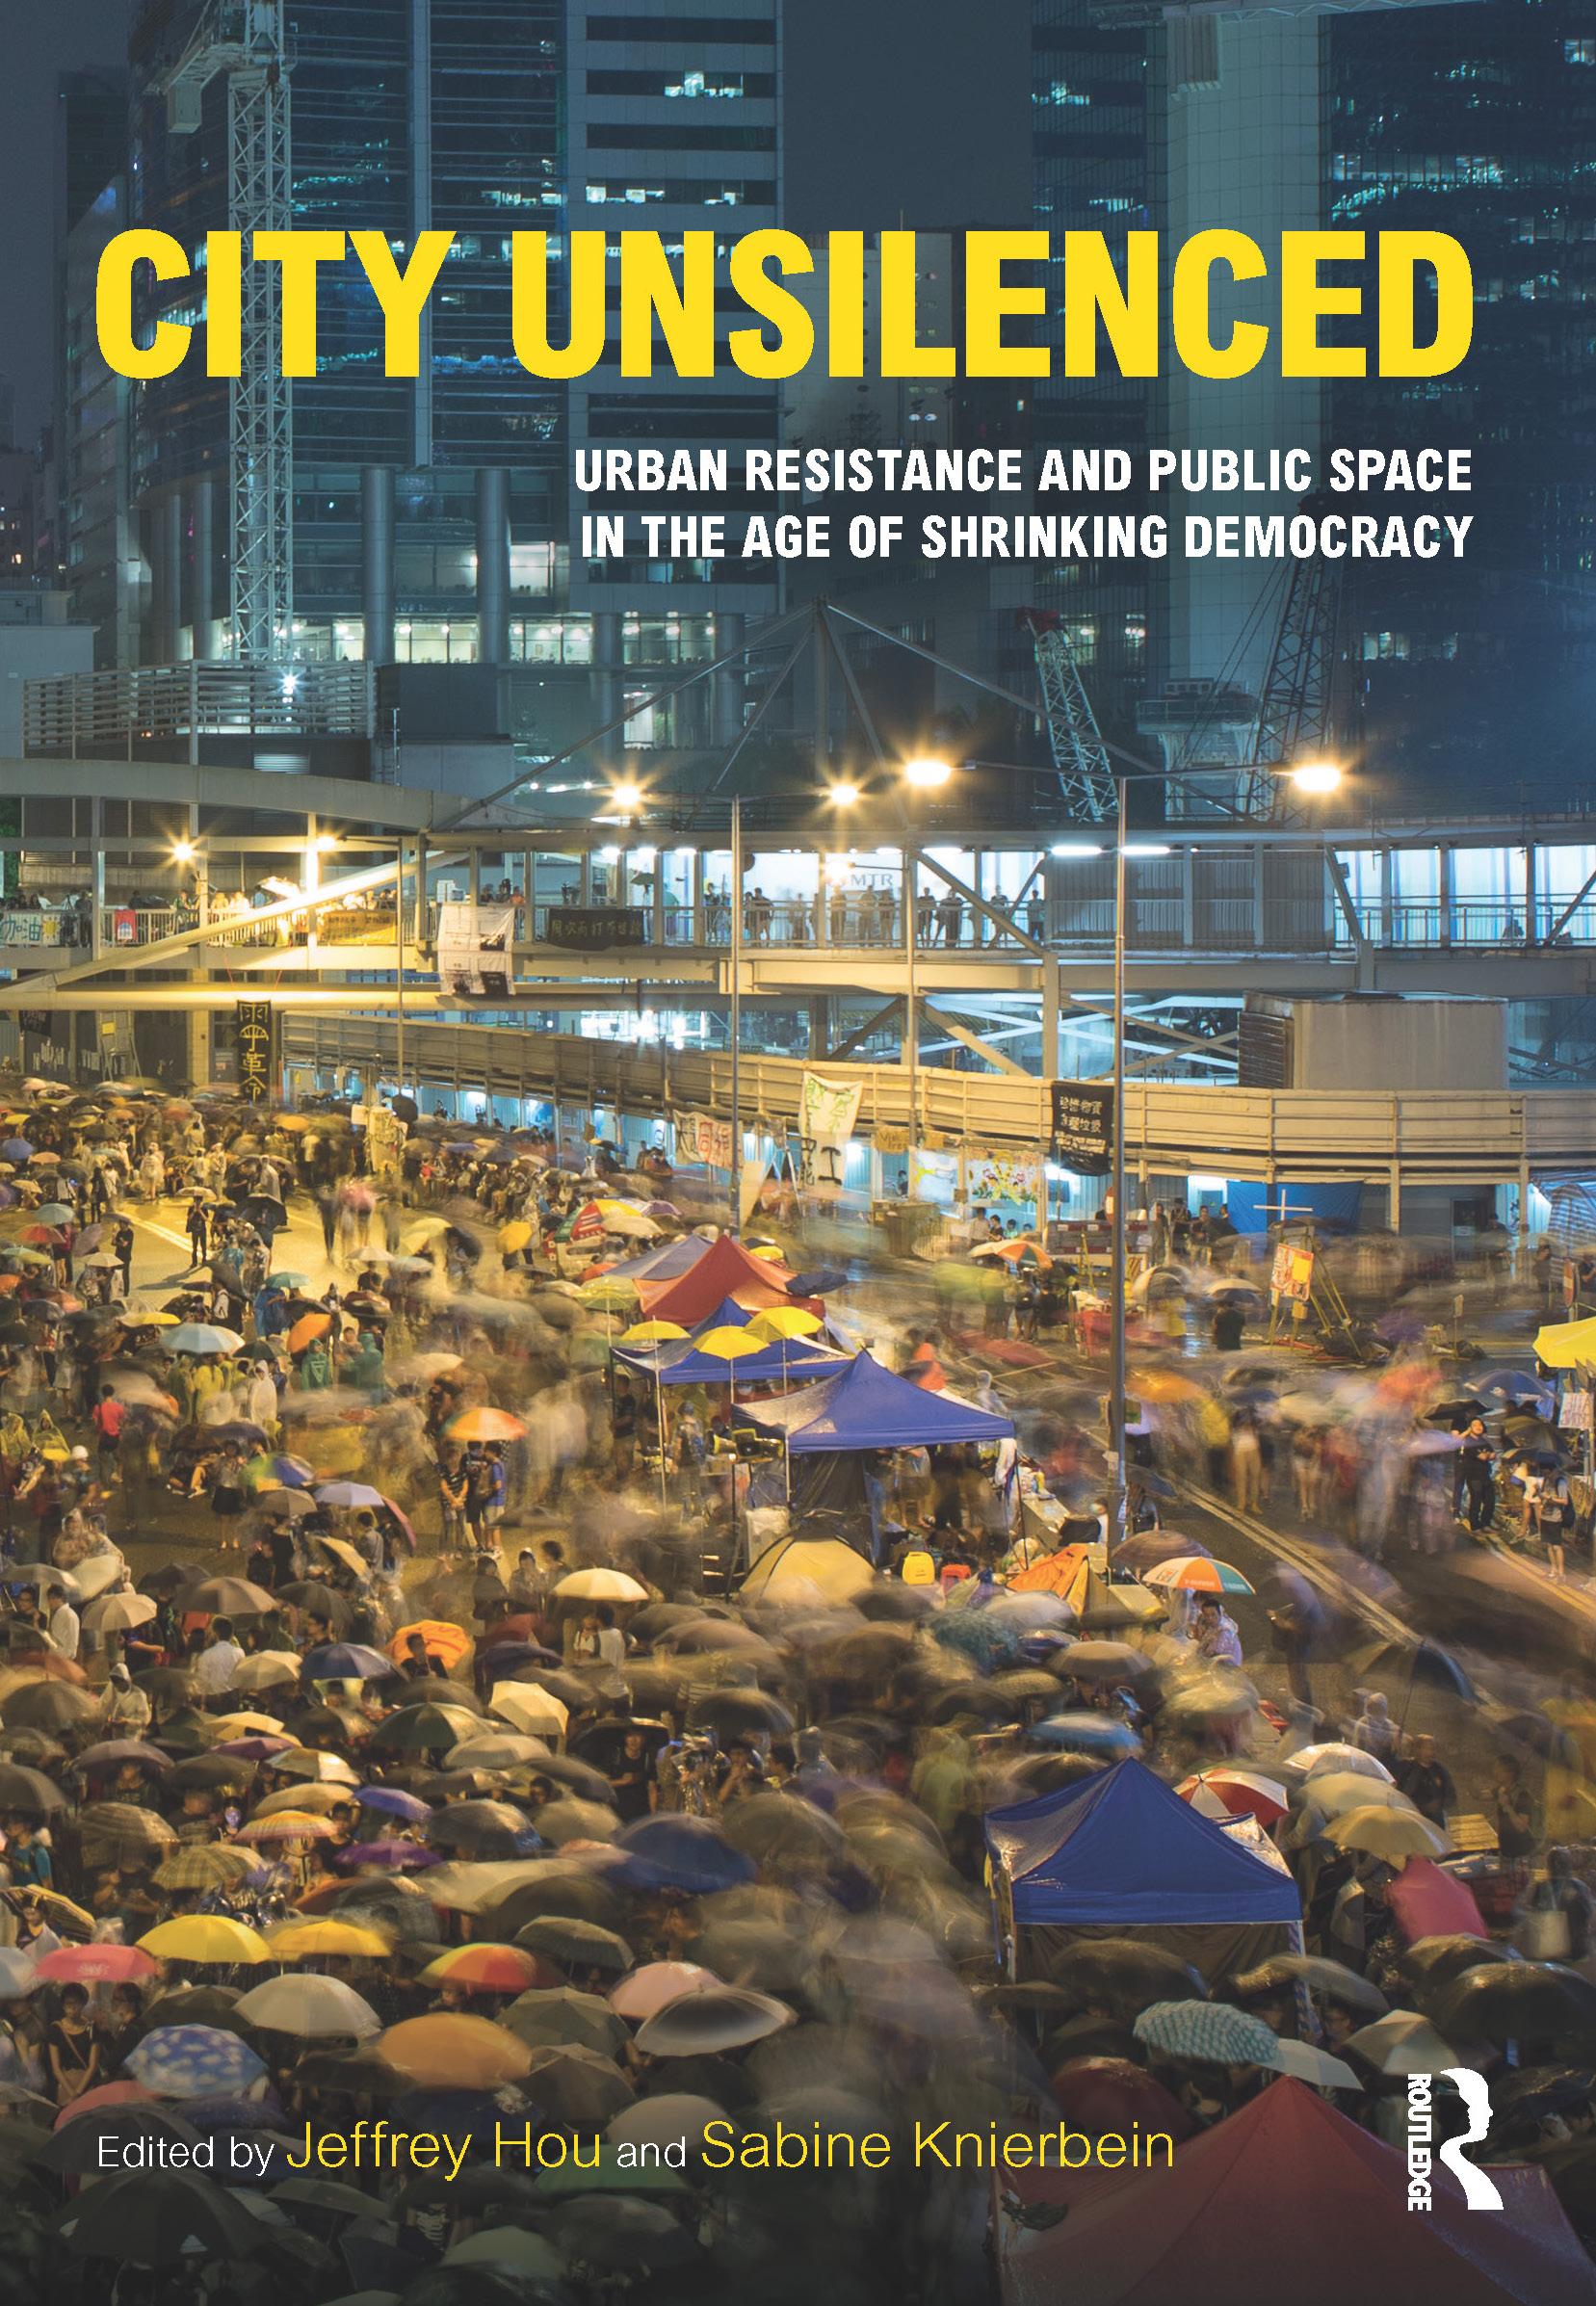 City Unsilenced (Image    ©   Jeffrey Hou)